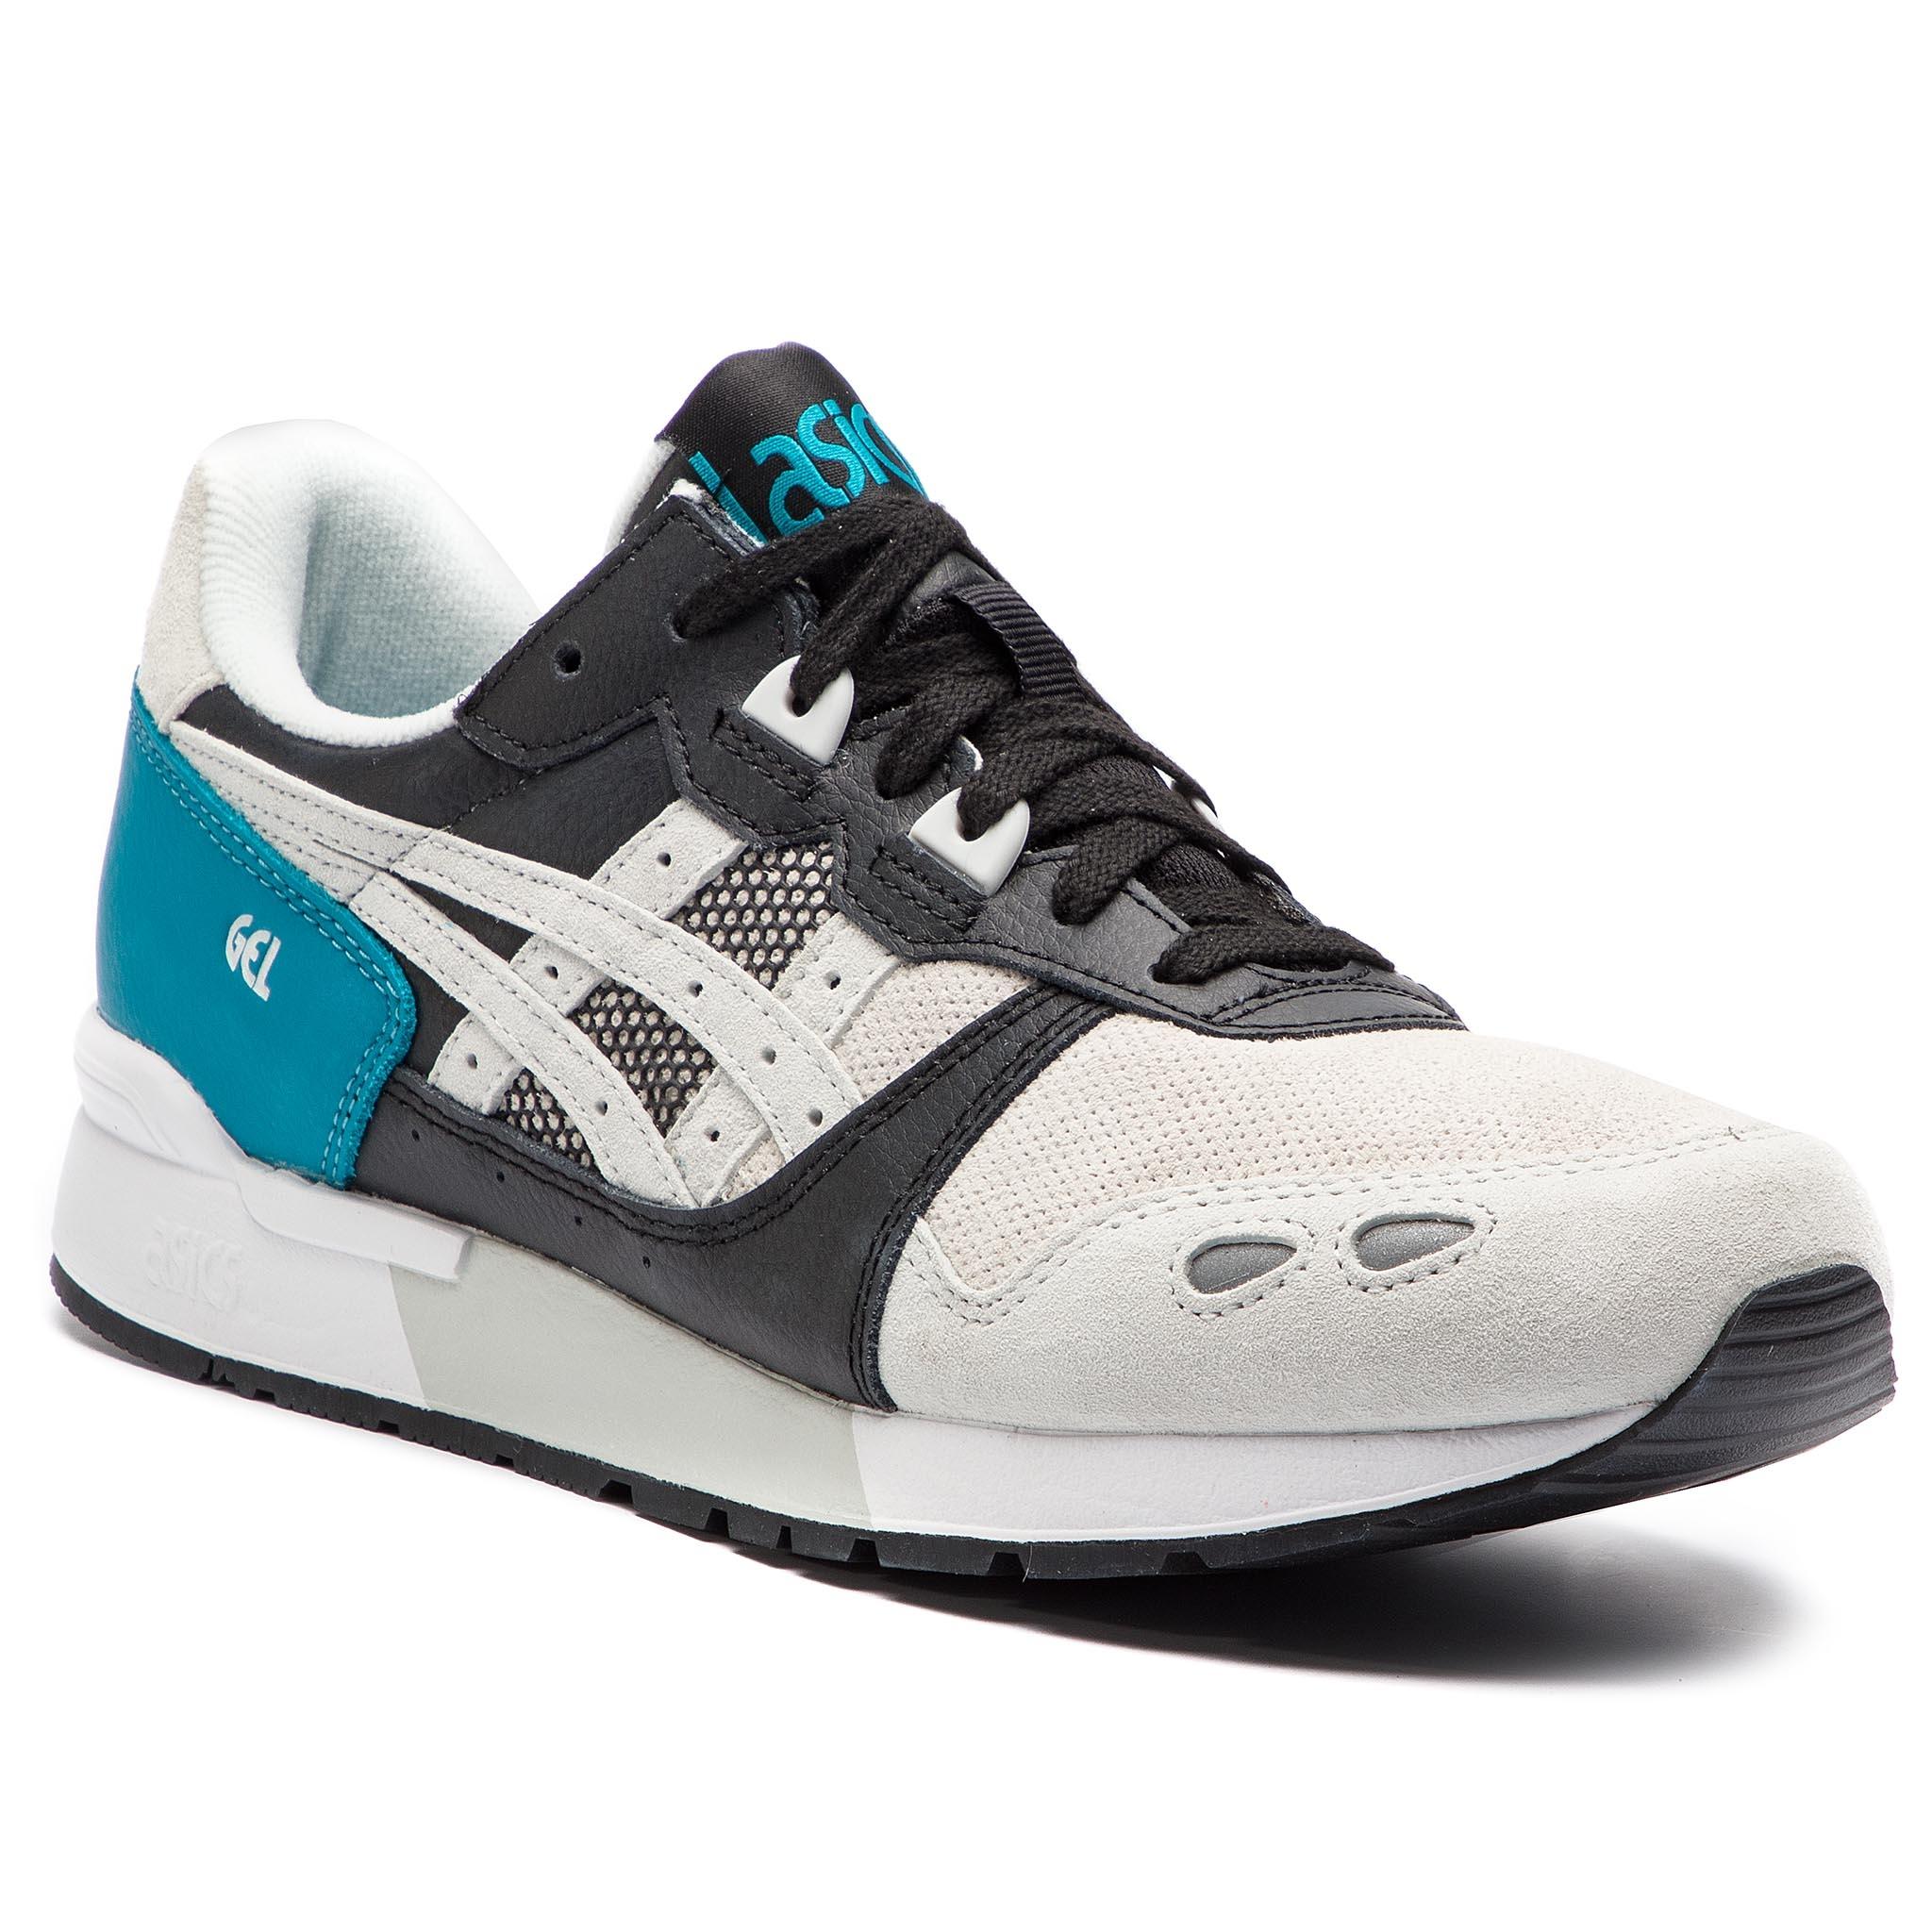 Mt Asics Sneakers Black Onitsuka Tiger 1183a203 Basketball Ok N8w0mn